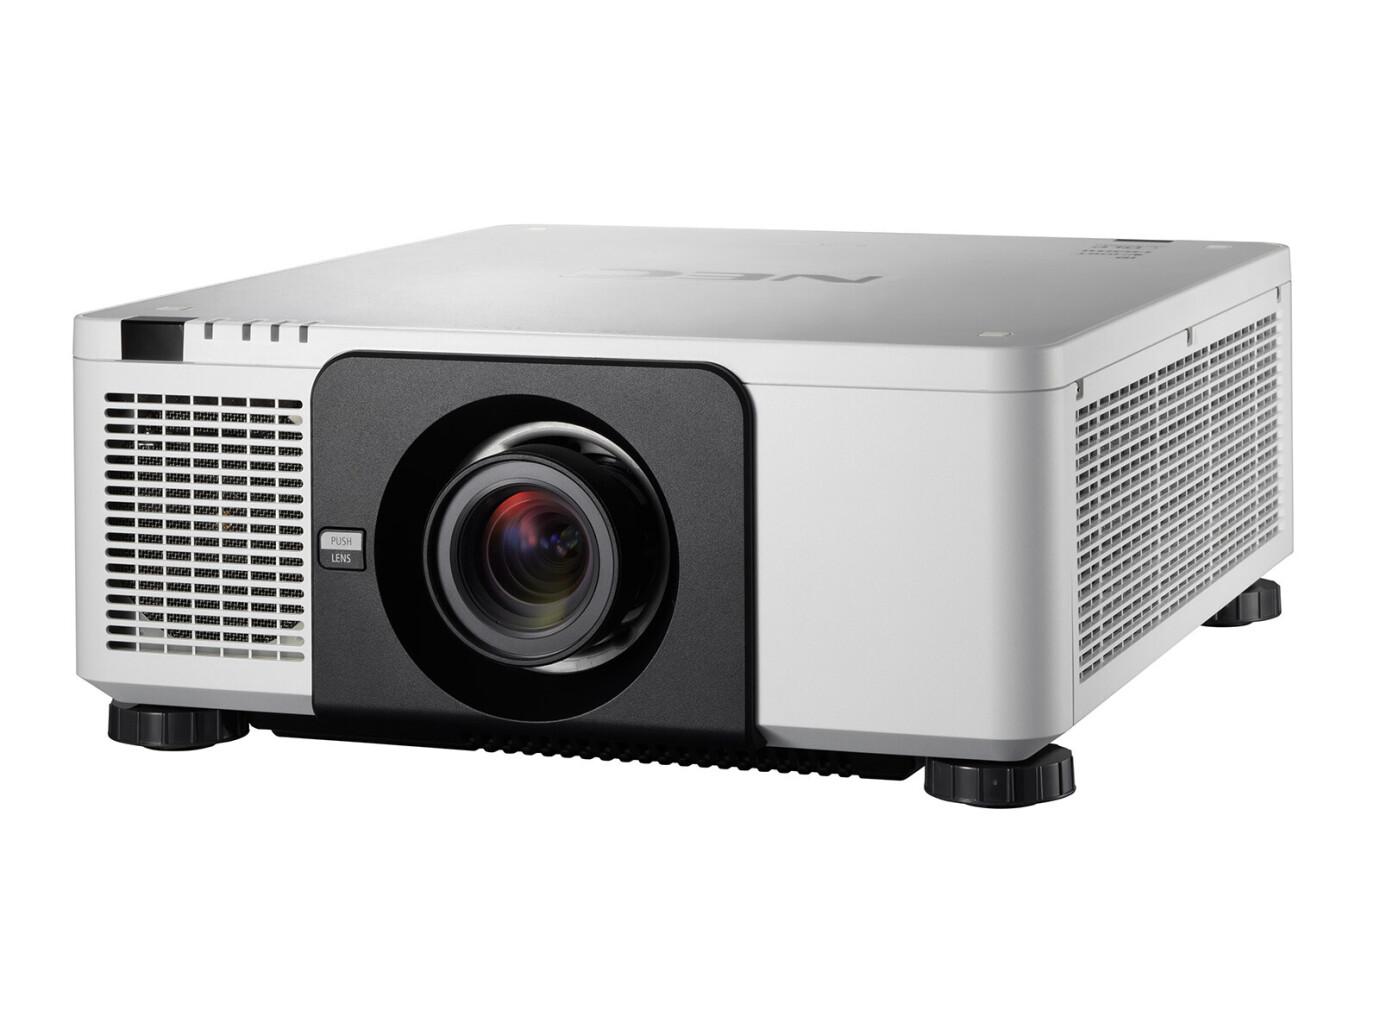 NEC PX803UL-WH (ohne Objektiv) Beamer, 8000 ANSI-Lumen, WUXGA